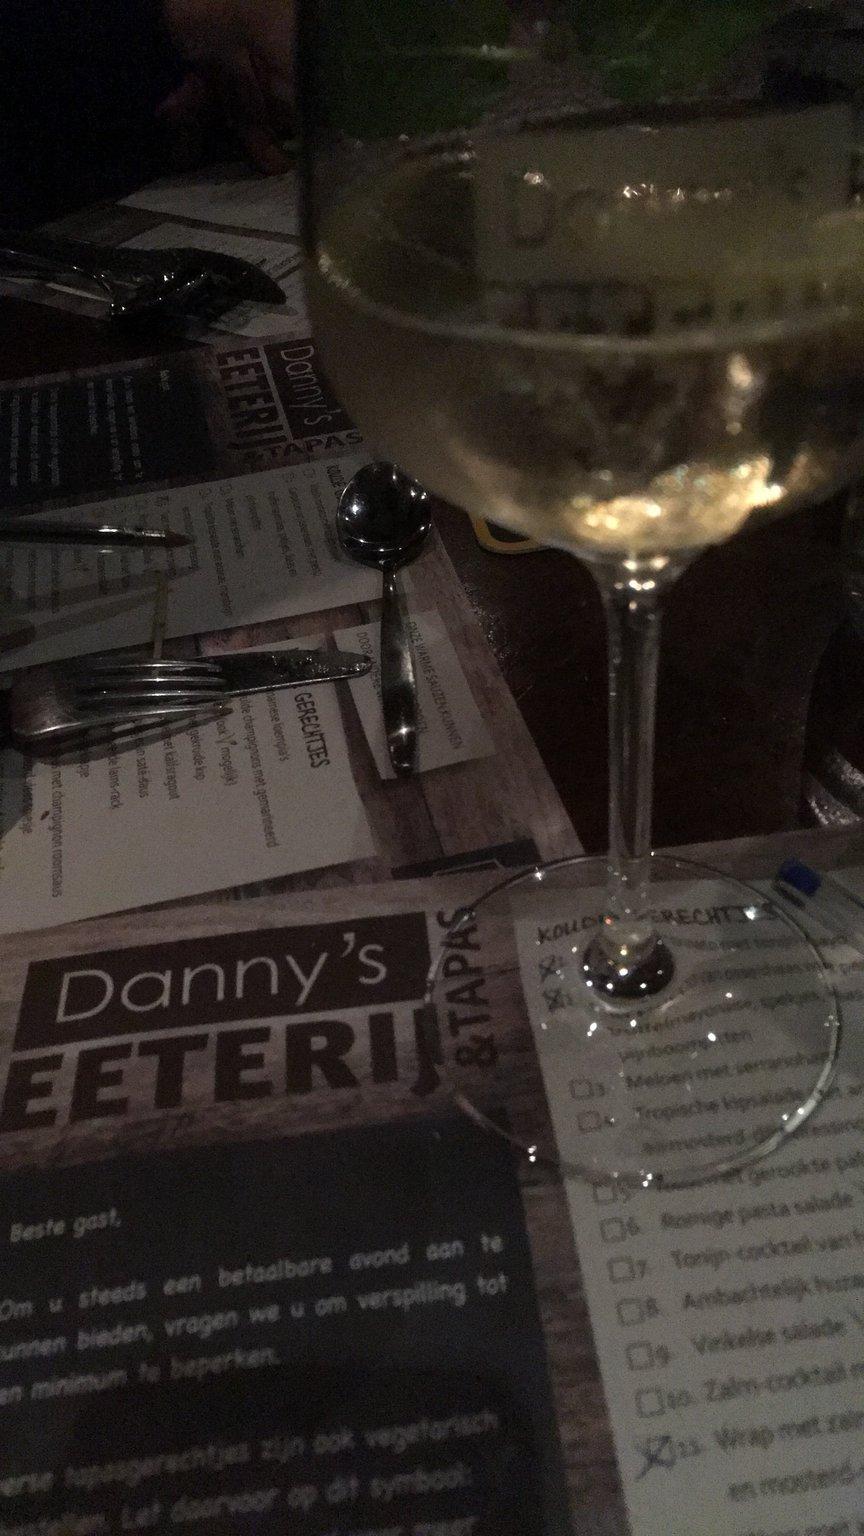 Danny's Eeterij & Tapas